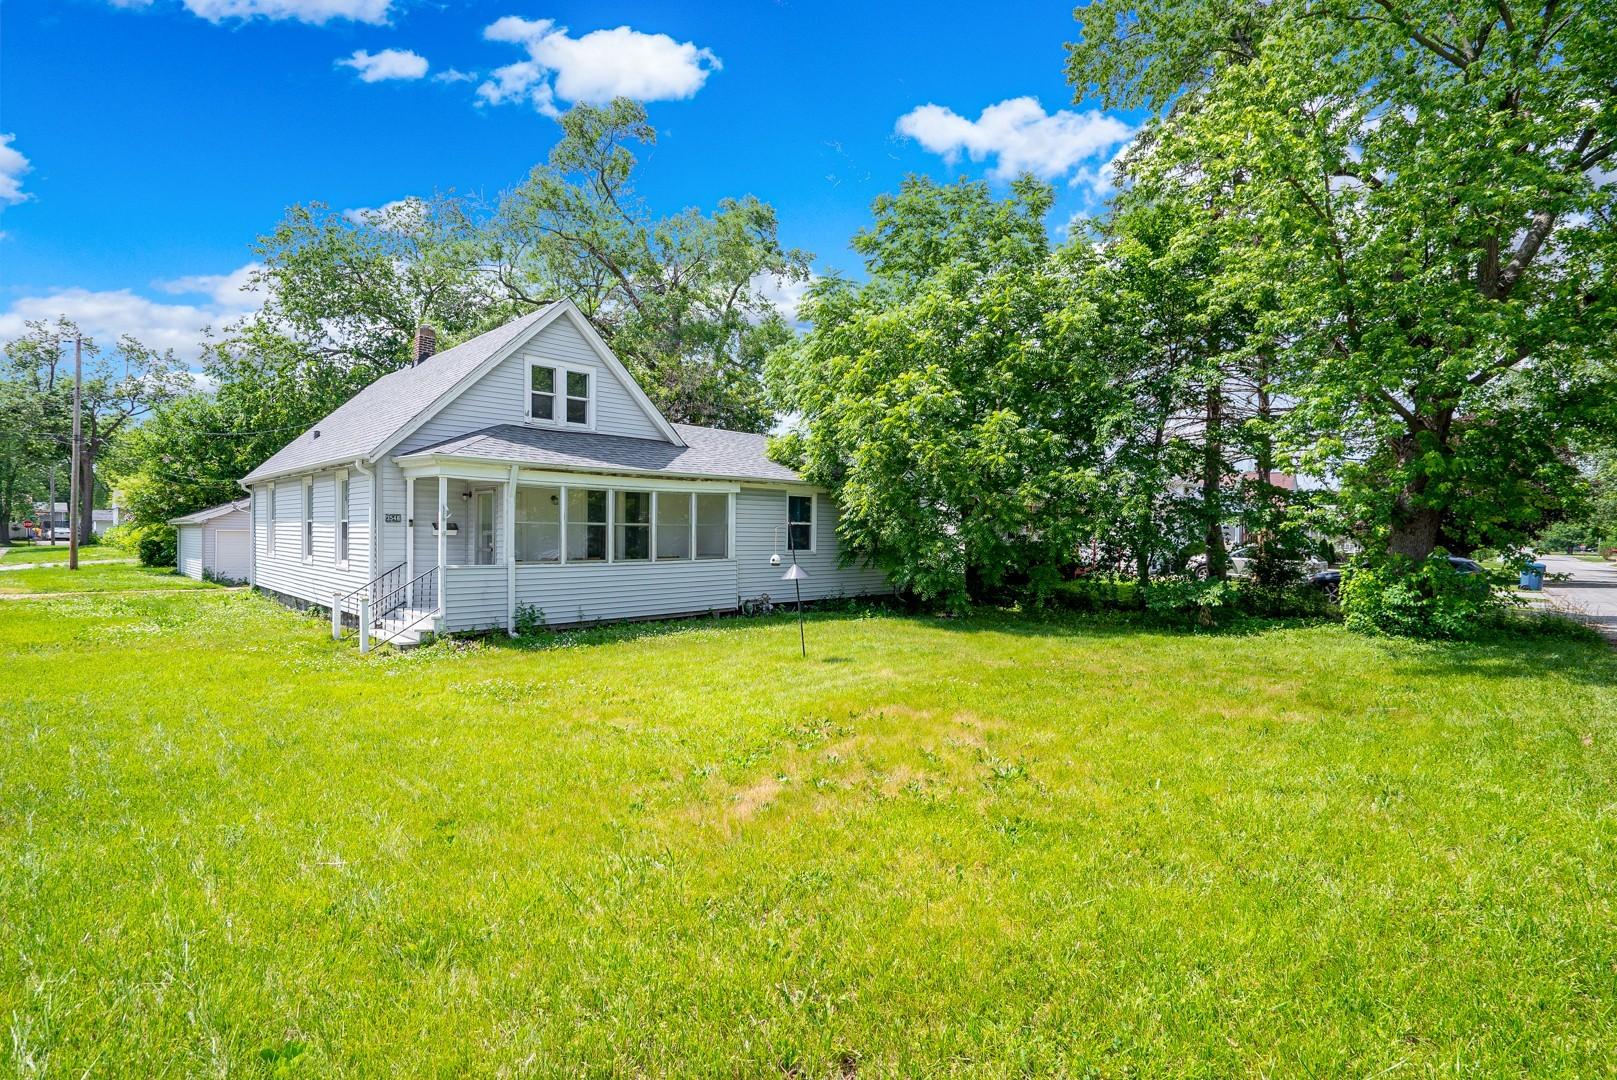 3548 Morgan Street, Steger, Illinois 60475, 4 Bedrooms Bedrooms, ,2 BathroomsBathrooms,Residential,For Sale,Morgan,MRD11128417